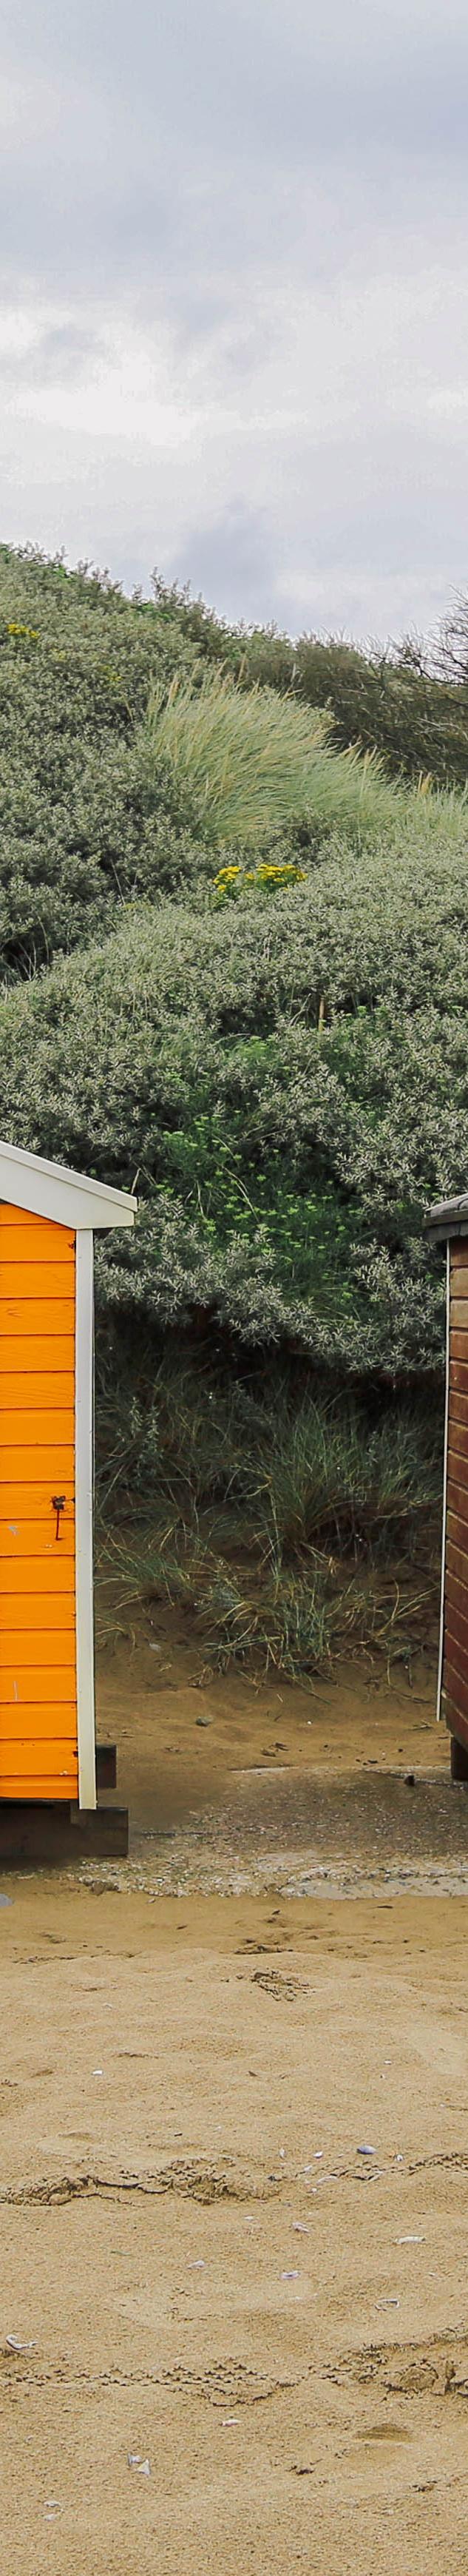 Saunton huts.jpg